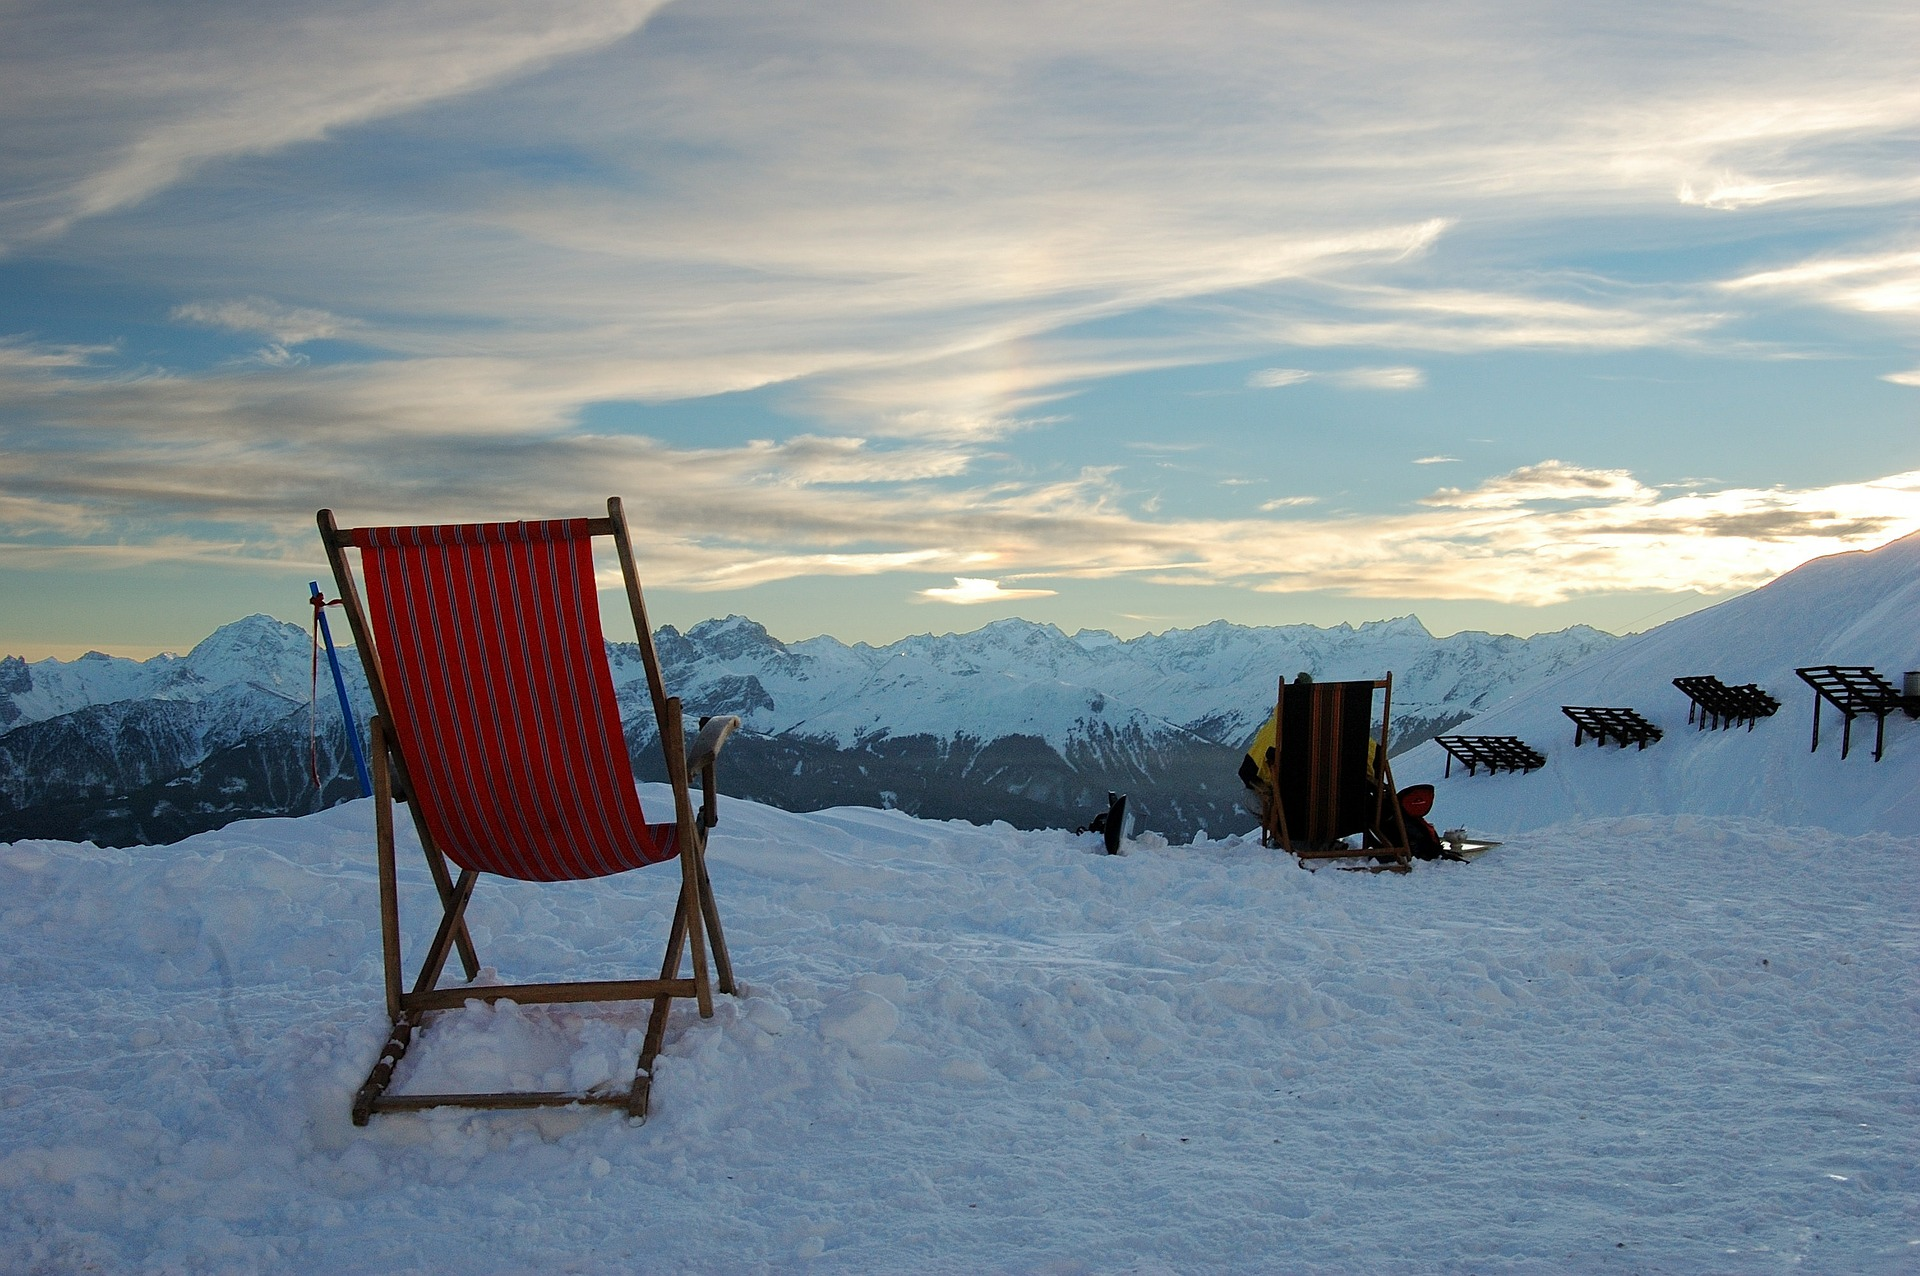 Faltcaravaning bei Schnee